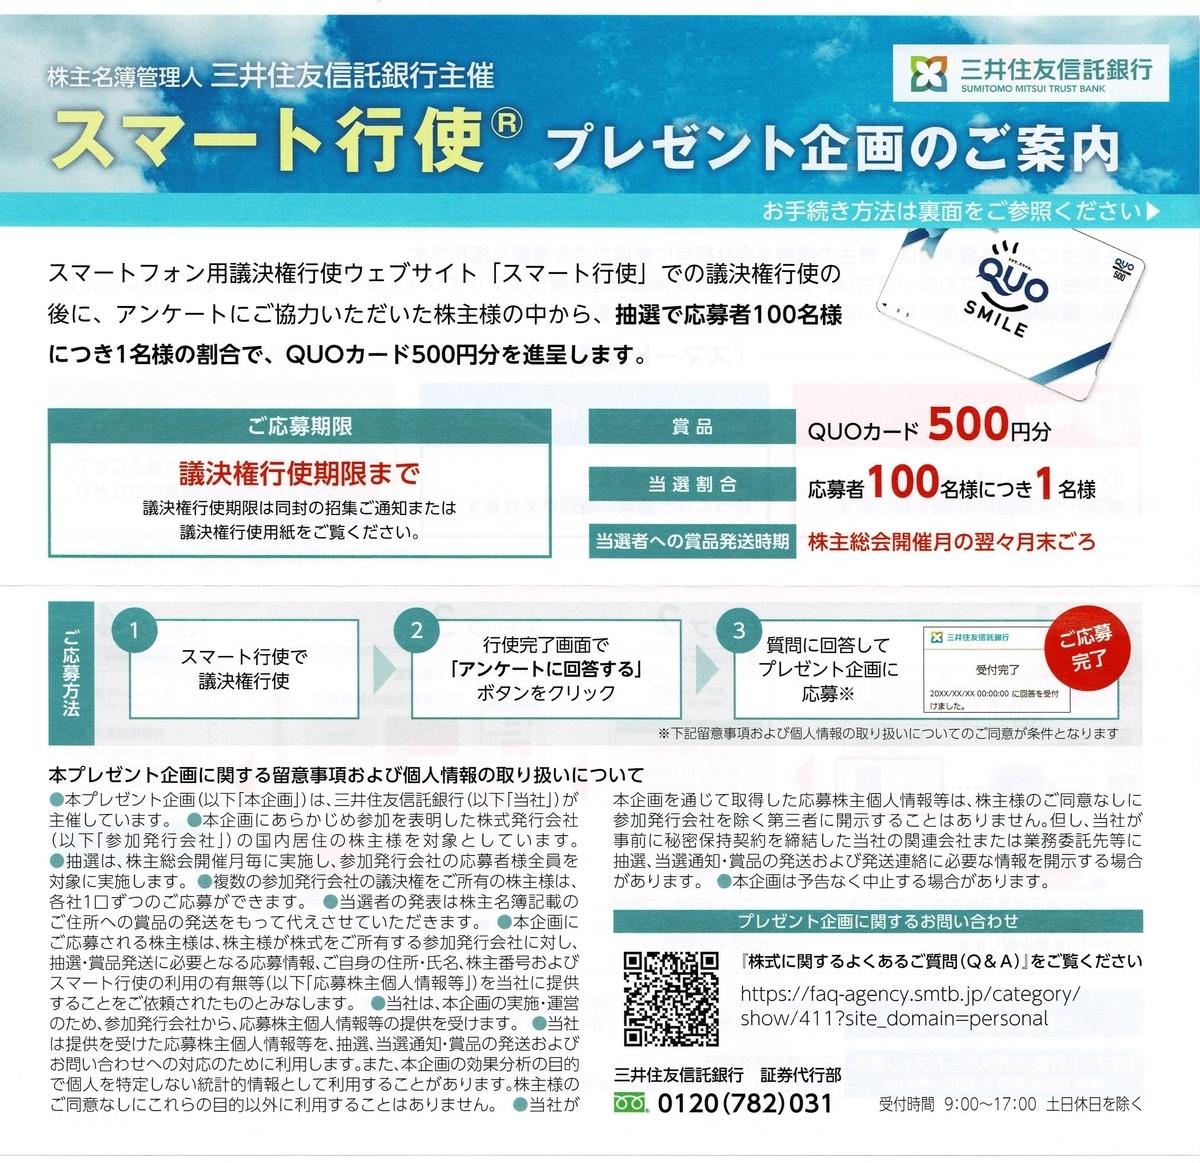 f:id:hanayamatoro:20210602195205j:plain